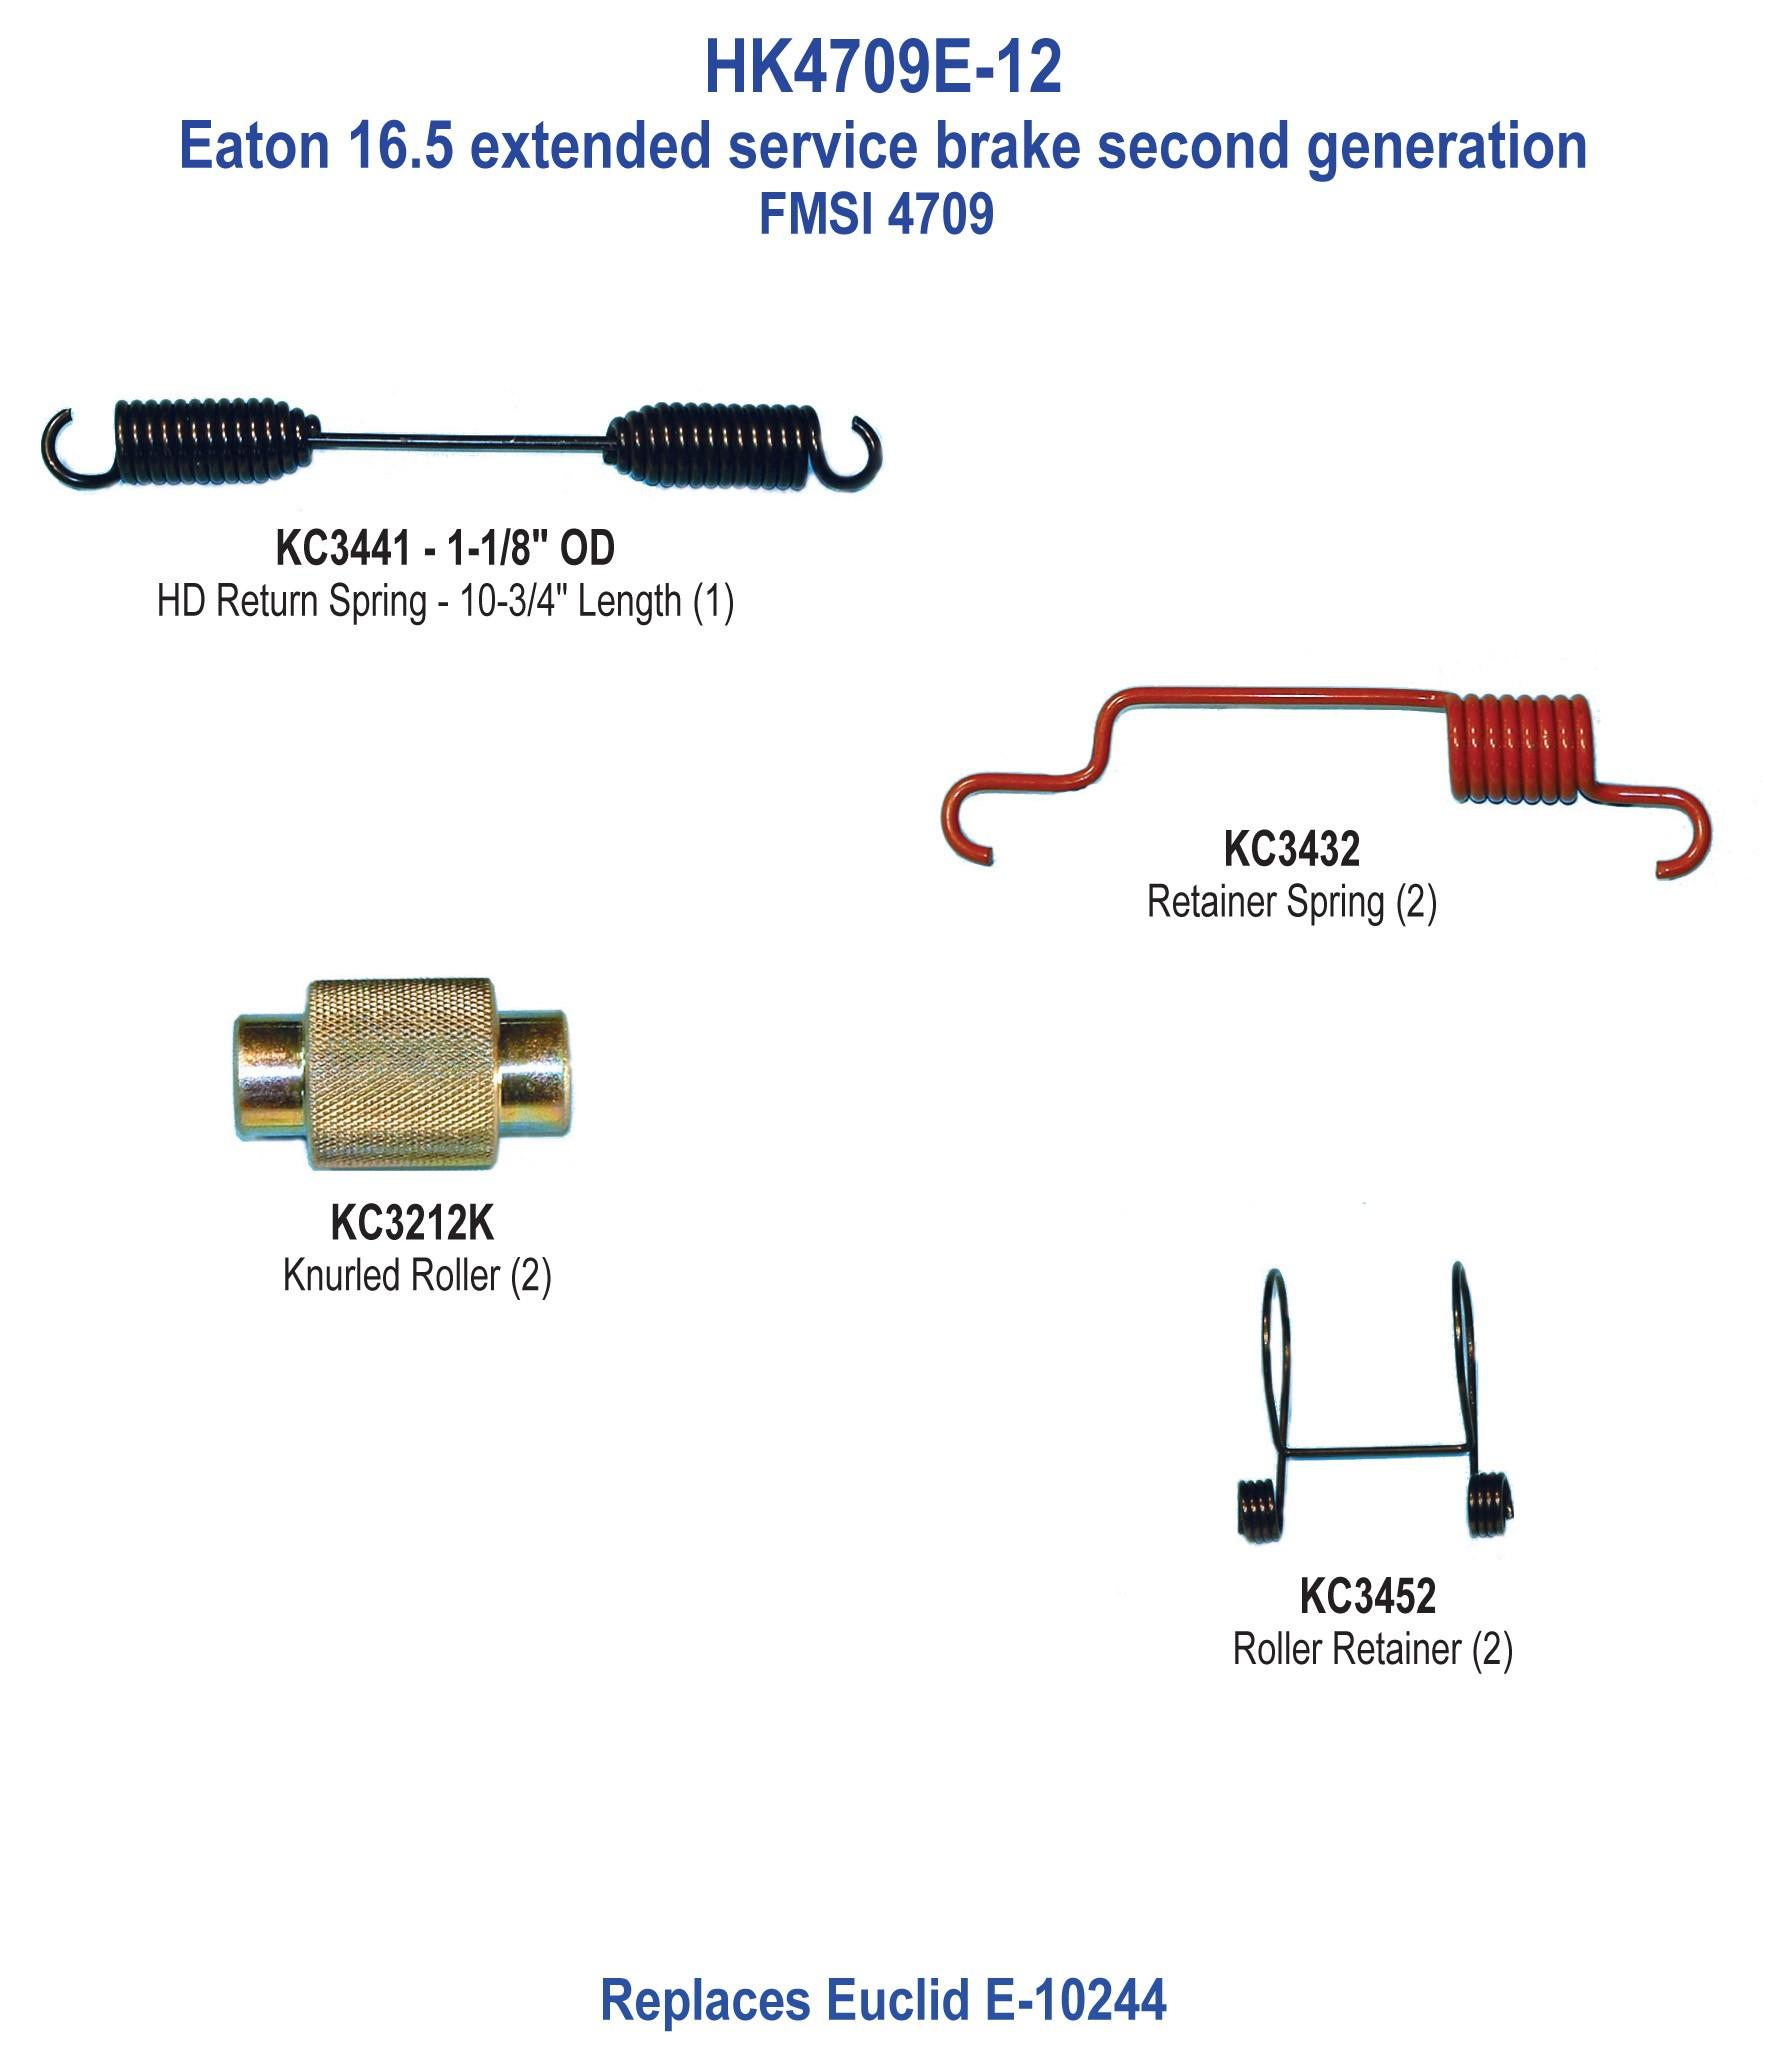 Brake Rotor Diagram New Lined Shoe Wheel Kits Wheel Kit Consists Of Wheel Kit Part Of Brake Rotor Diagram